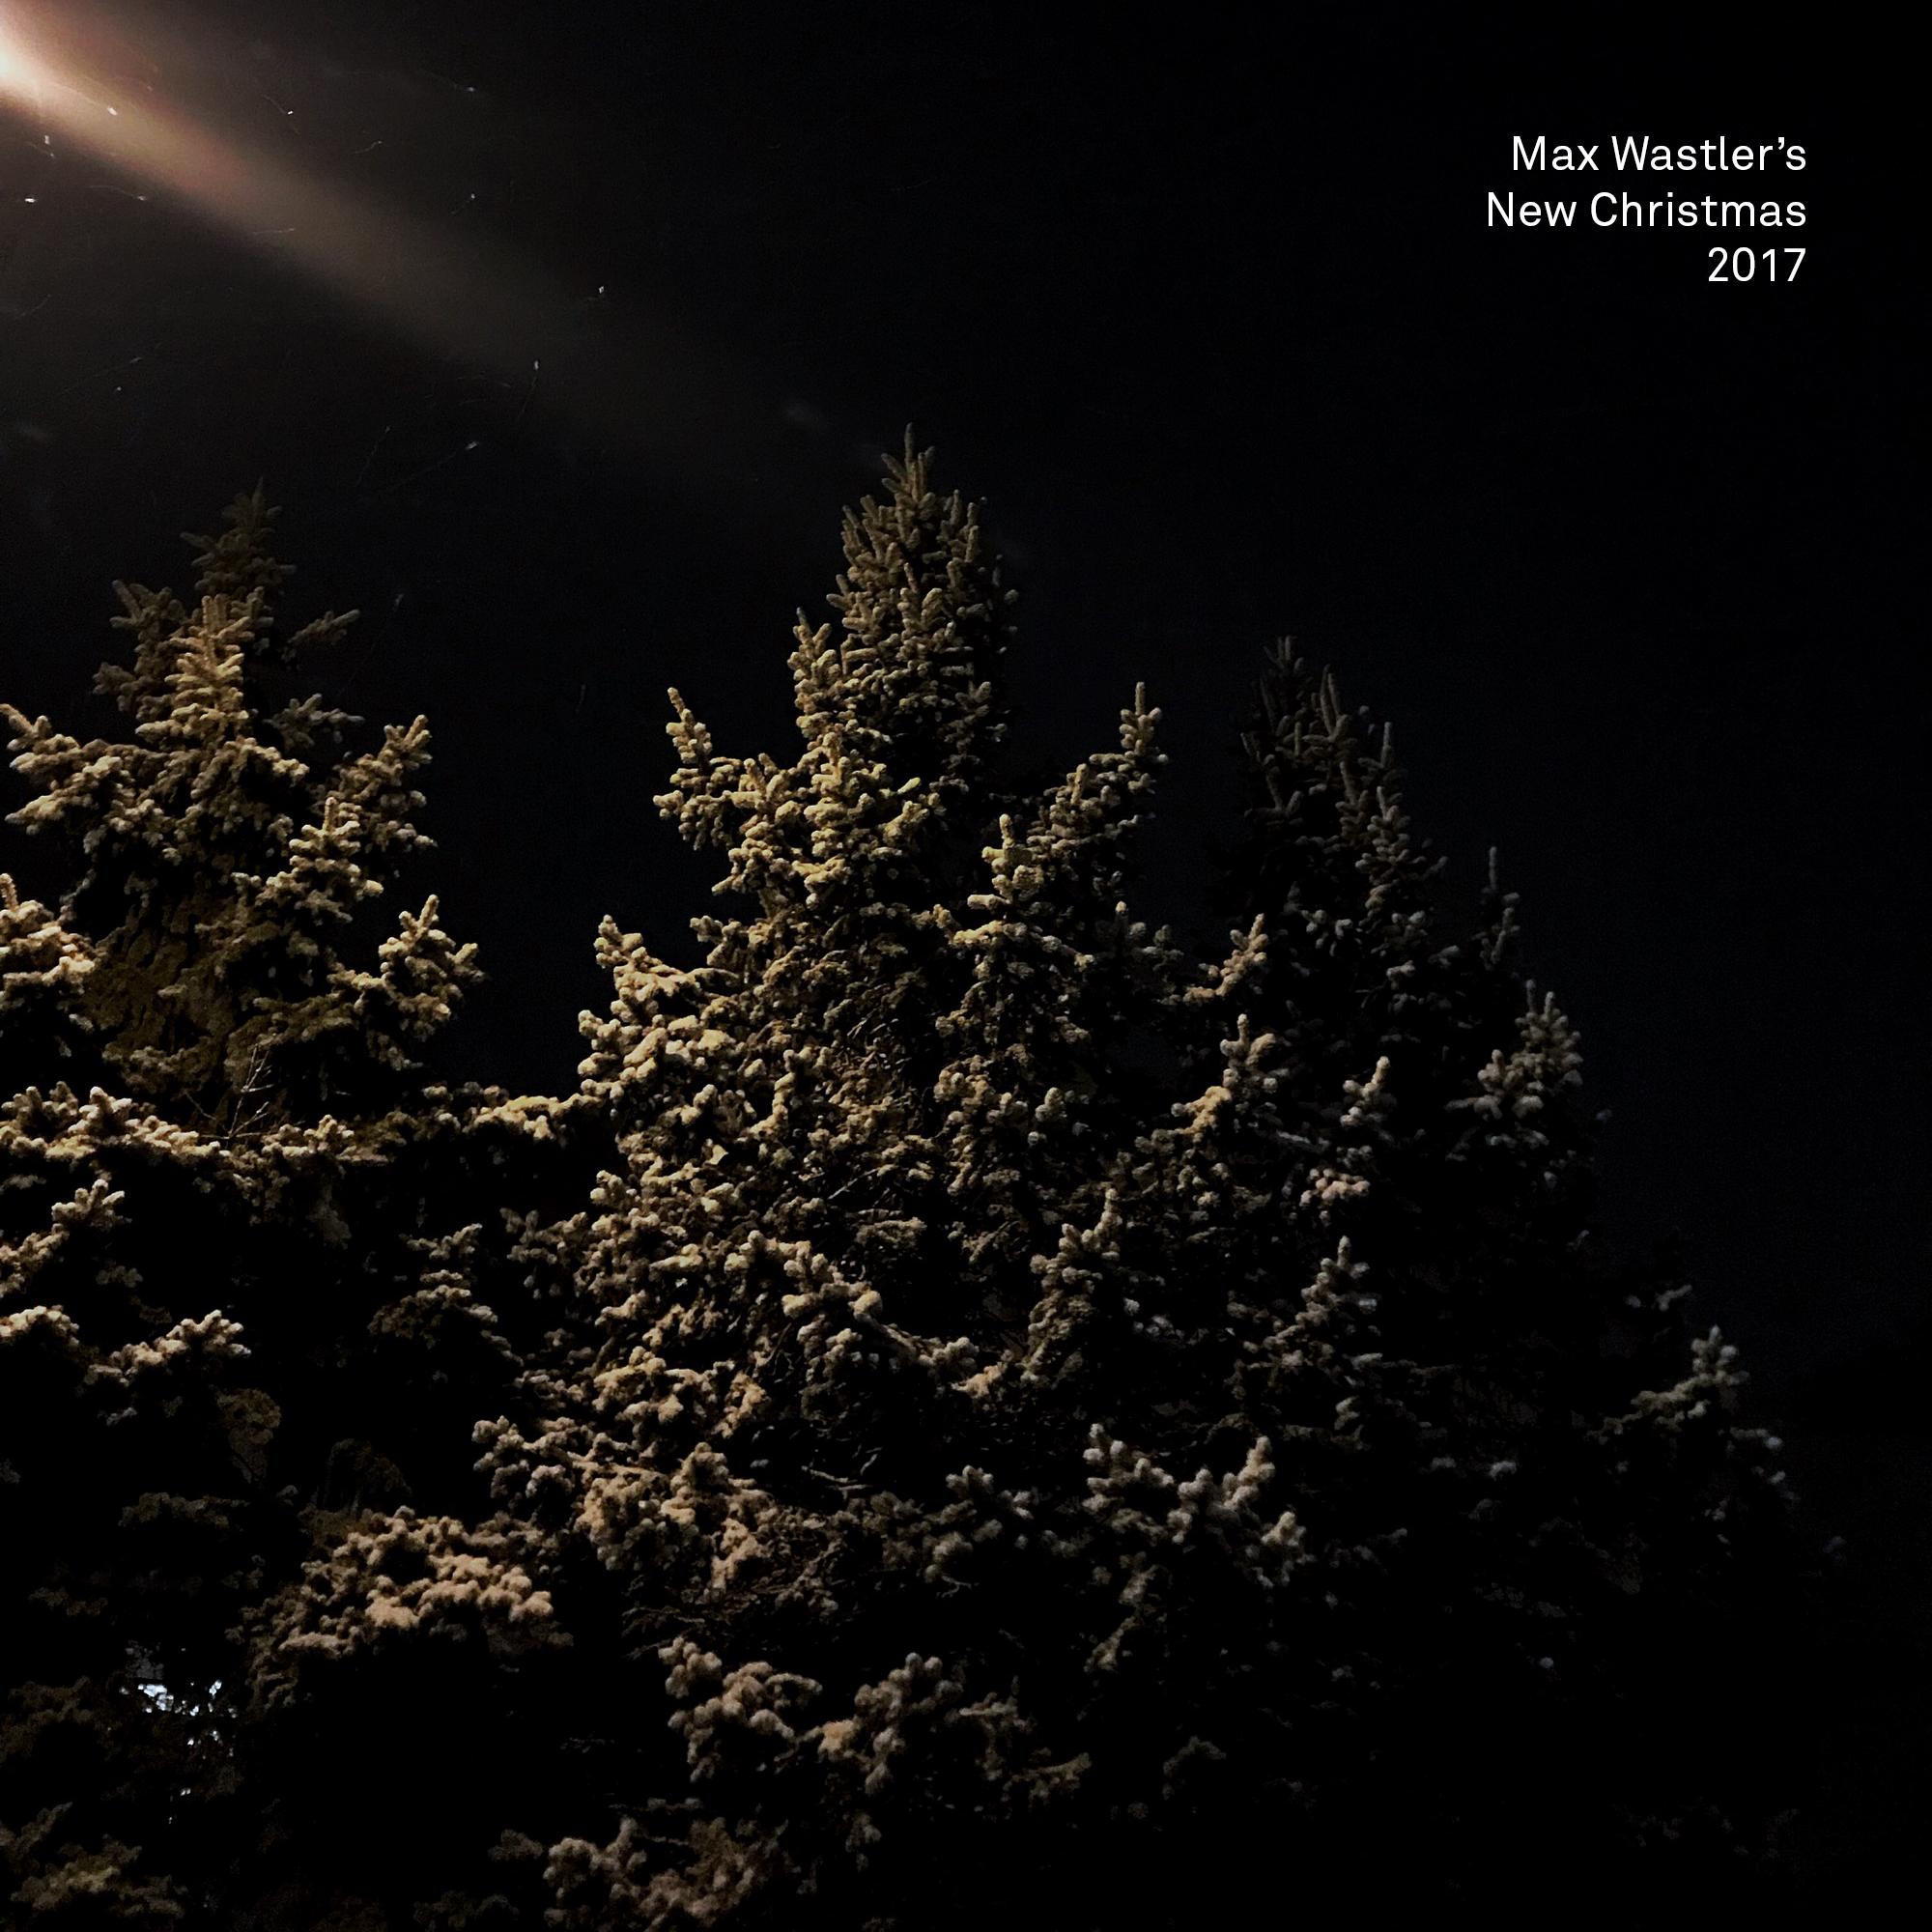 Max Wastlers New Christmas 2017.jpg